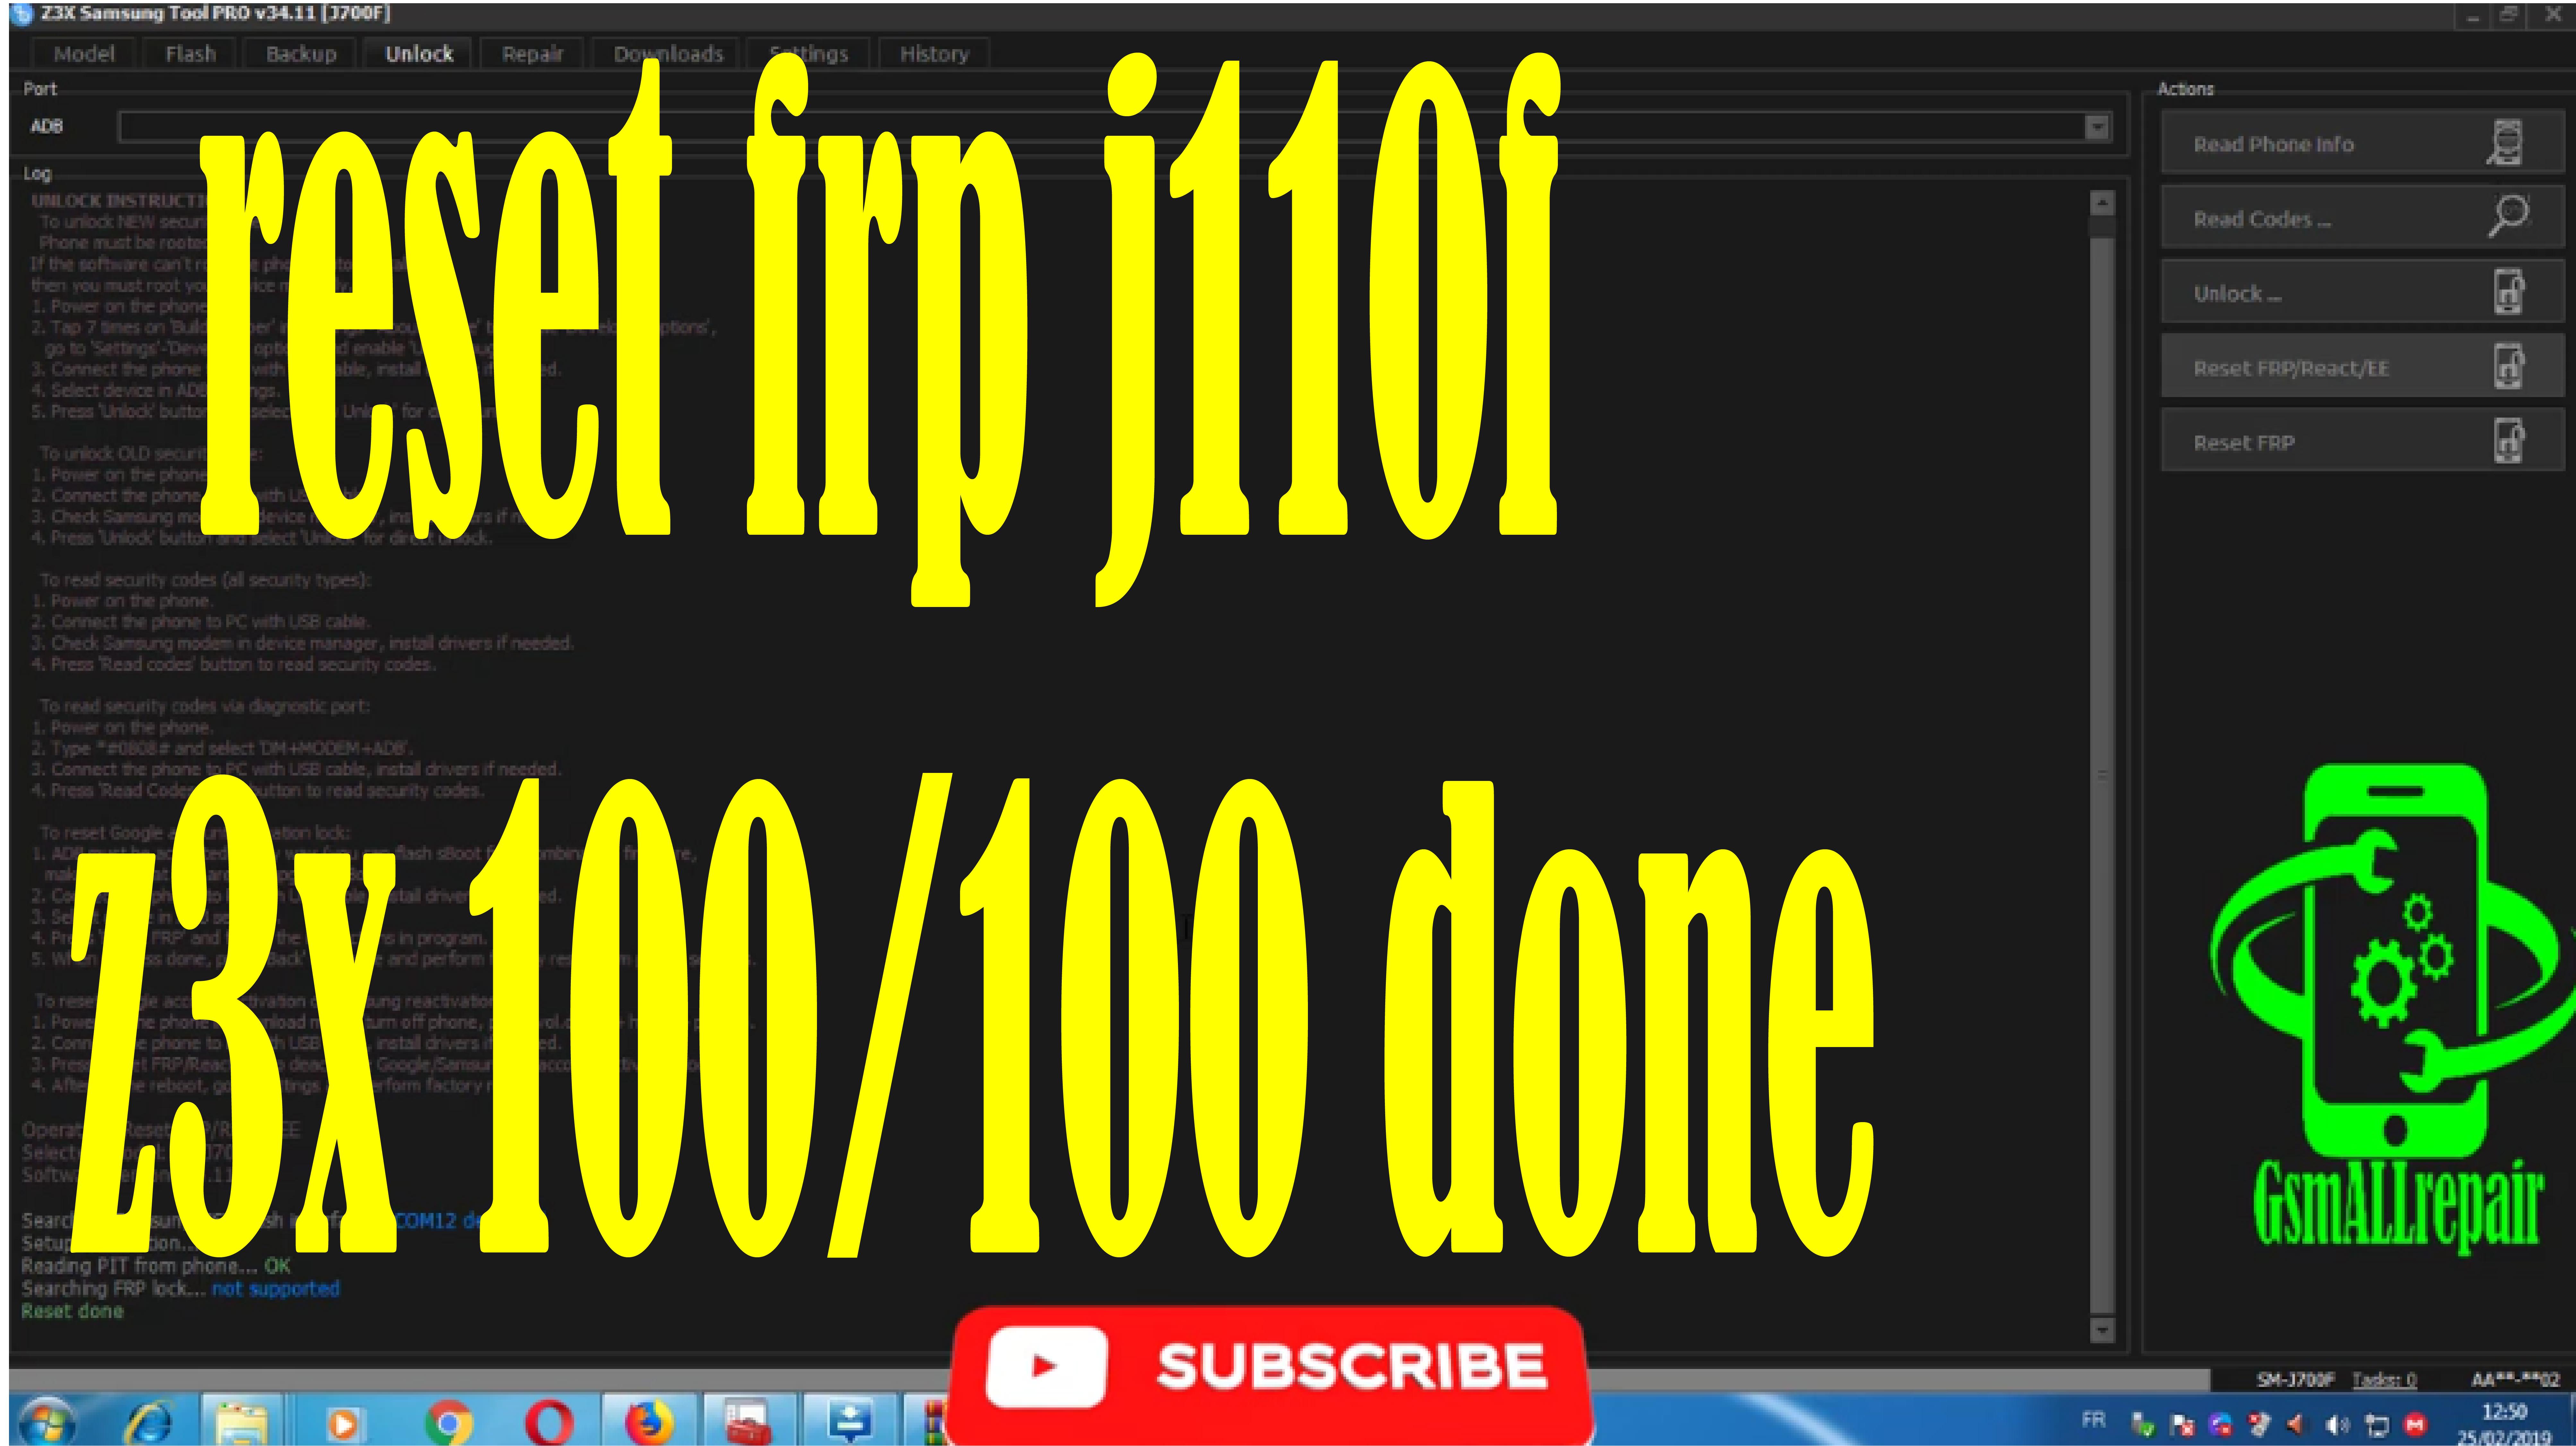 reset frp j110f z3x 100/100 done | frp samsung